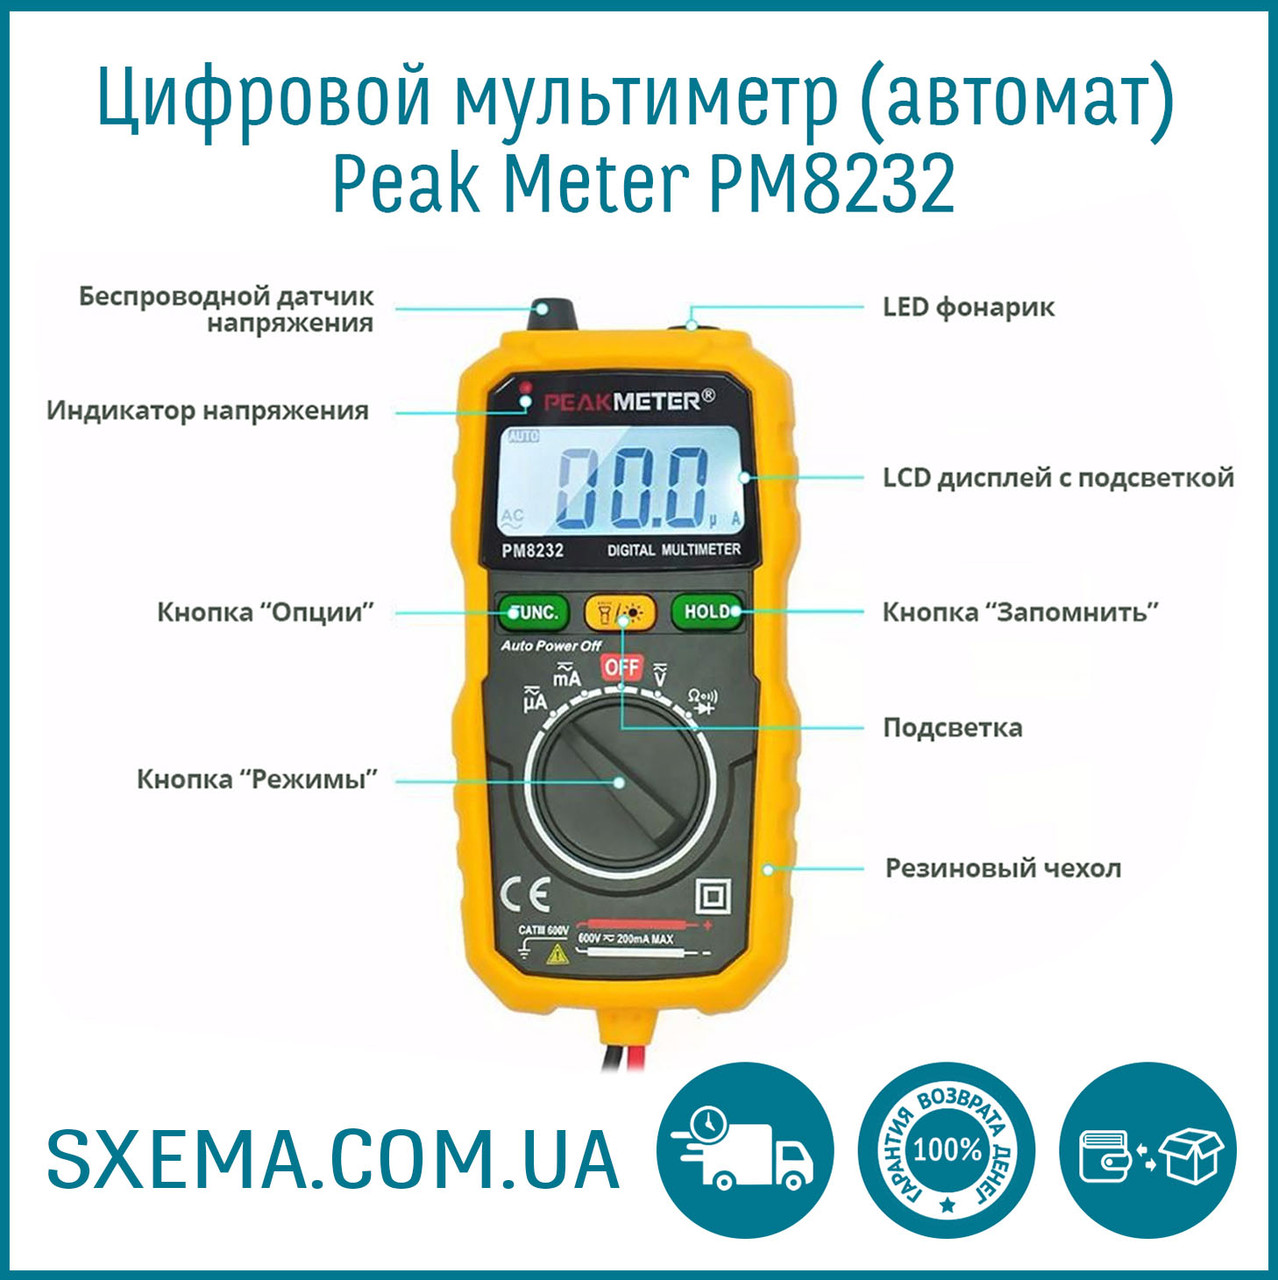 Мультиметр цифровой PeakMeter PM8232 портативный, автомат, вольтметр, амперметр, прозвонка